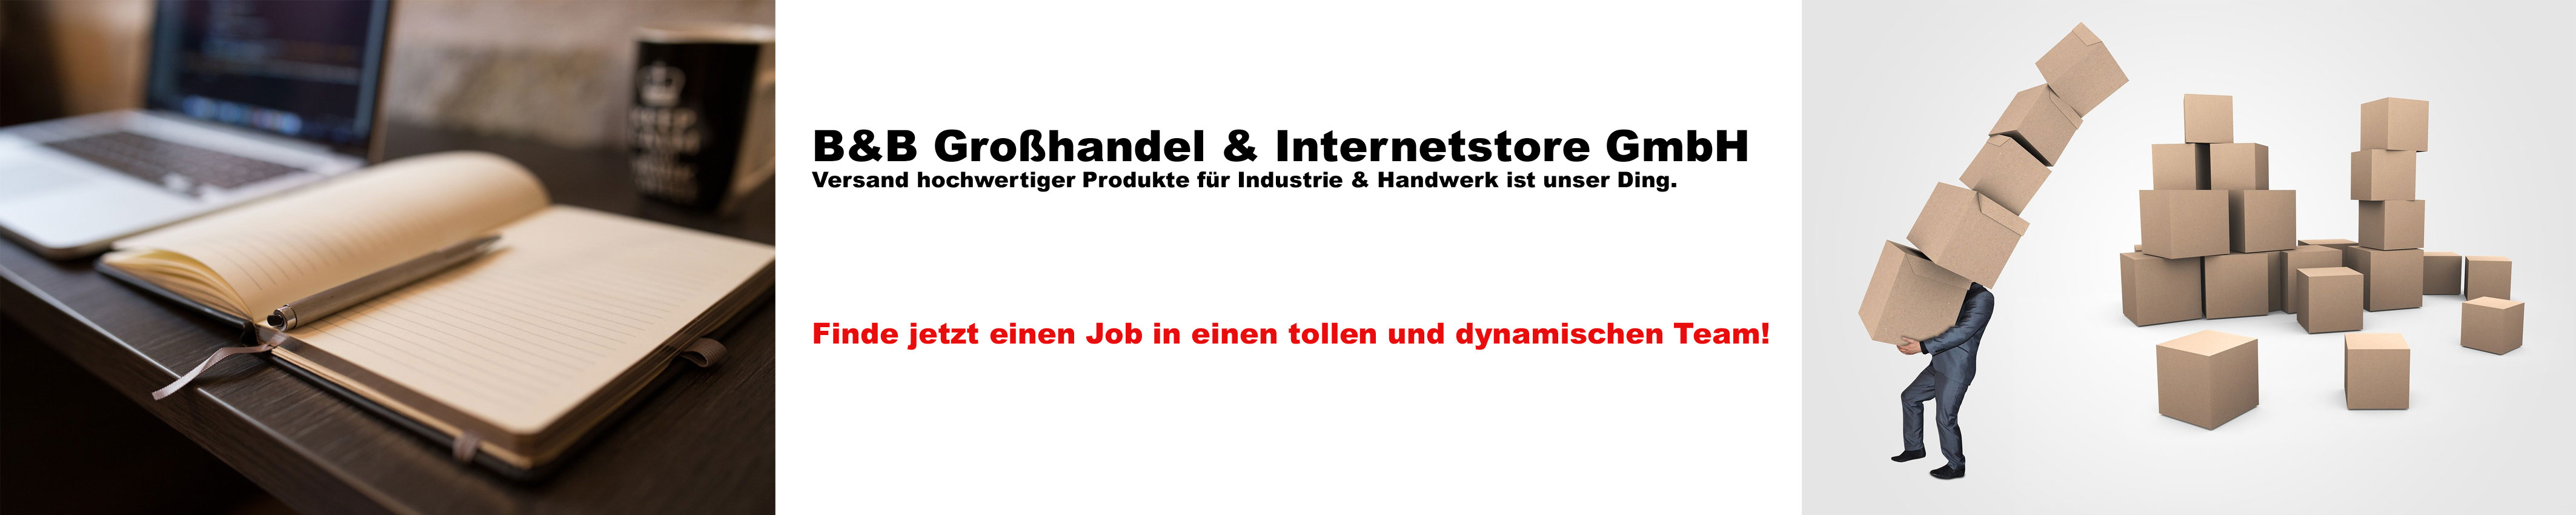 job-stellen-bundb-grosshand